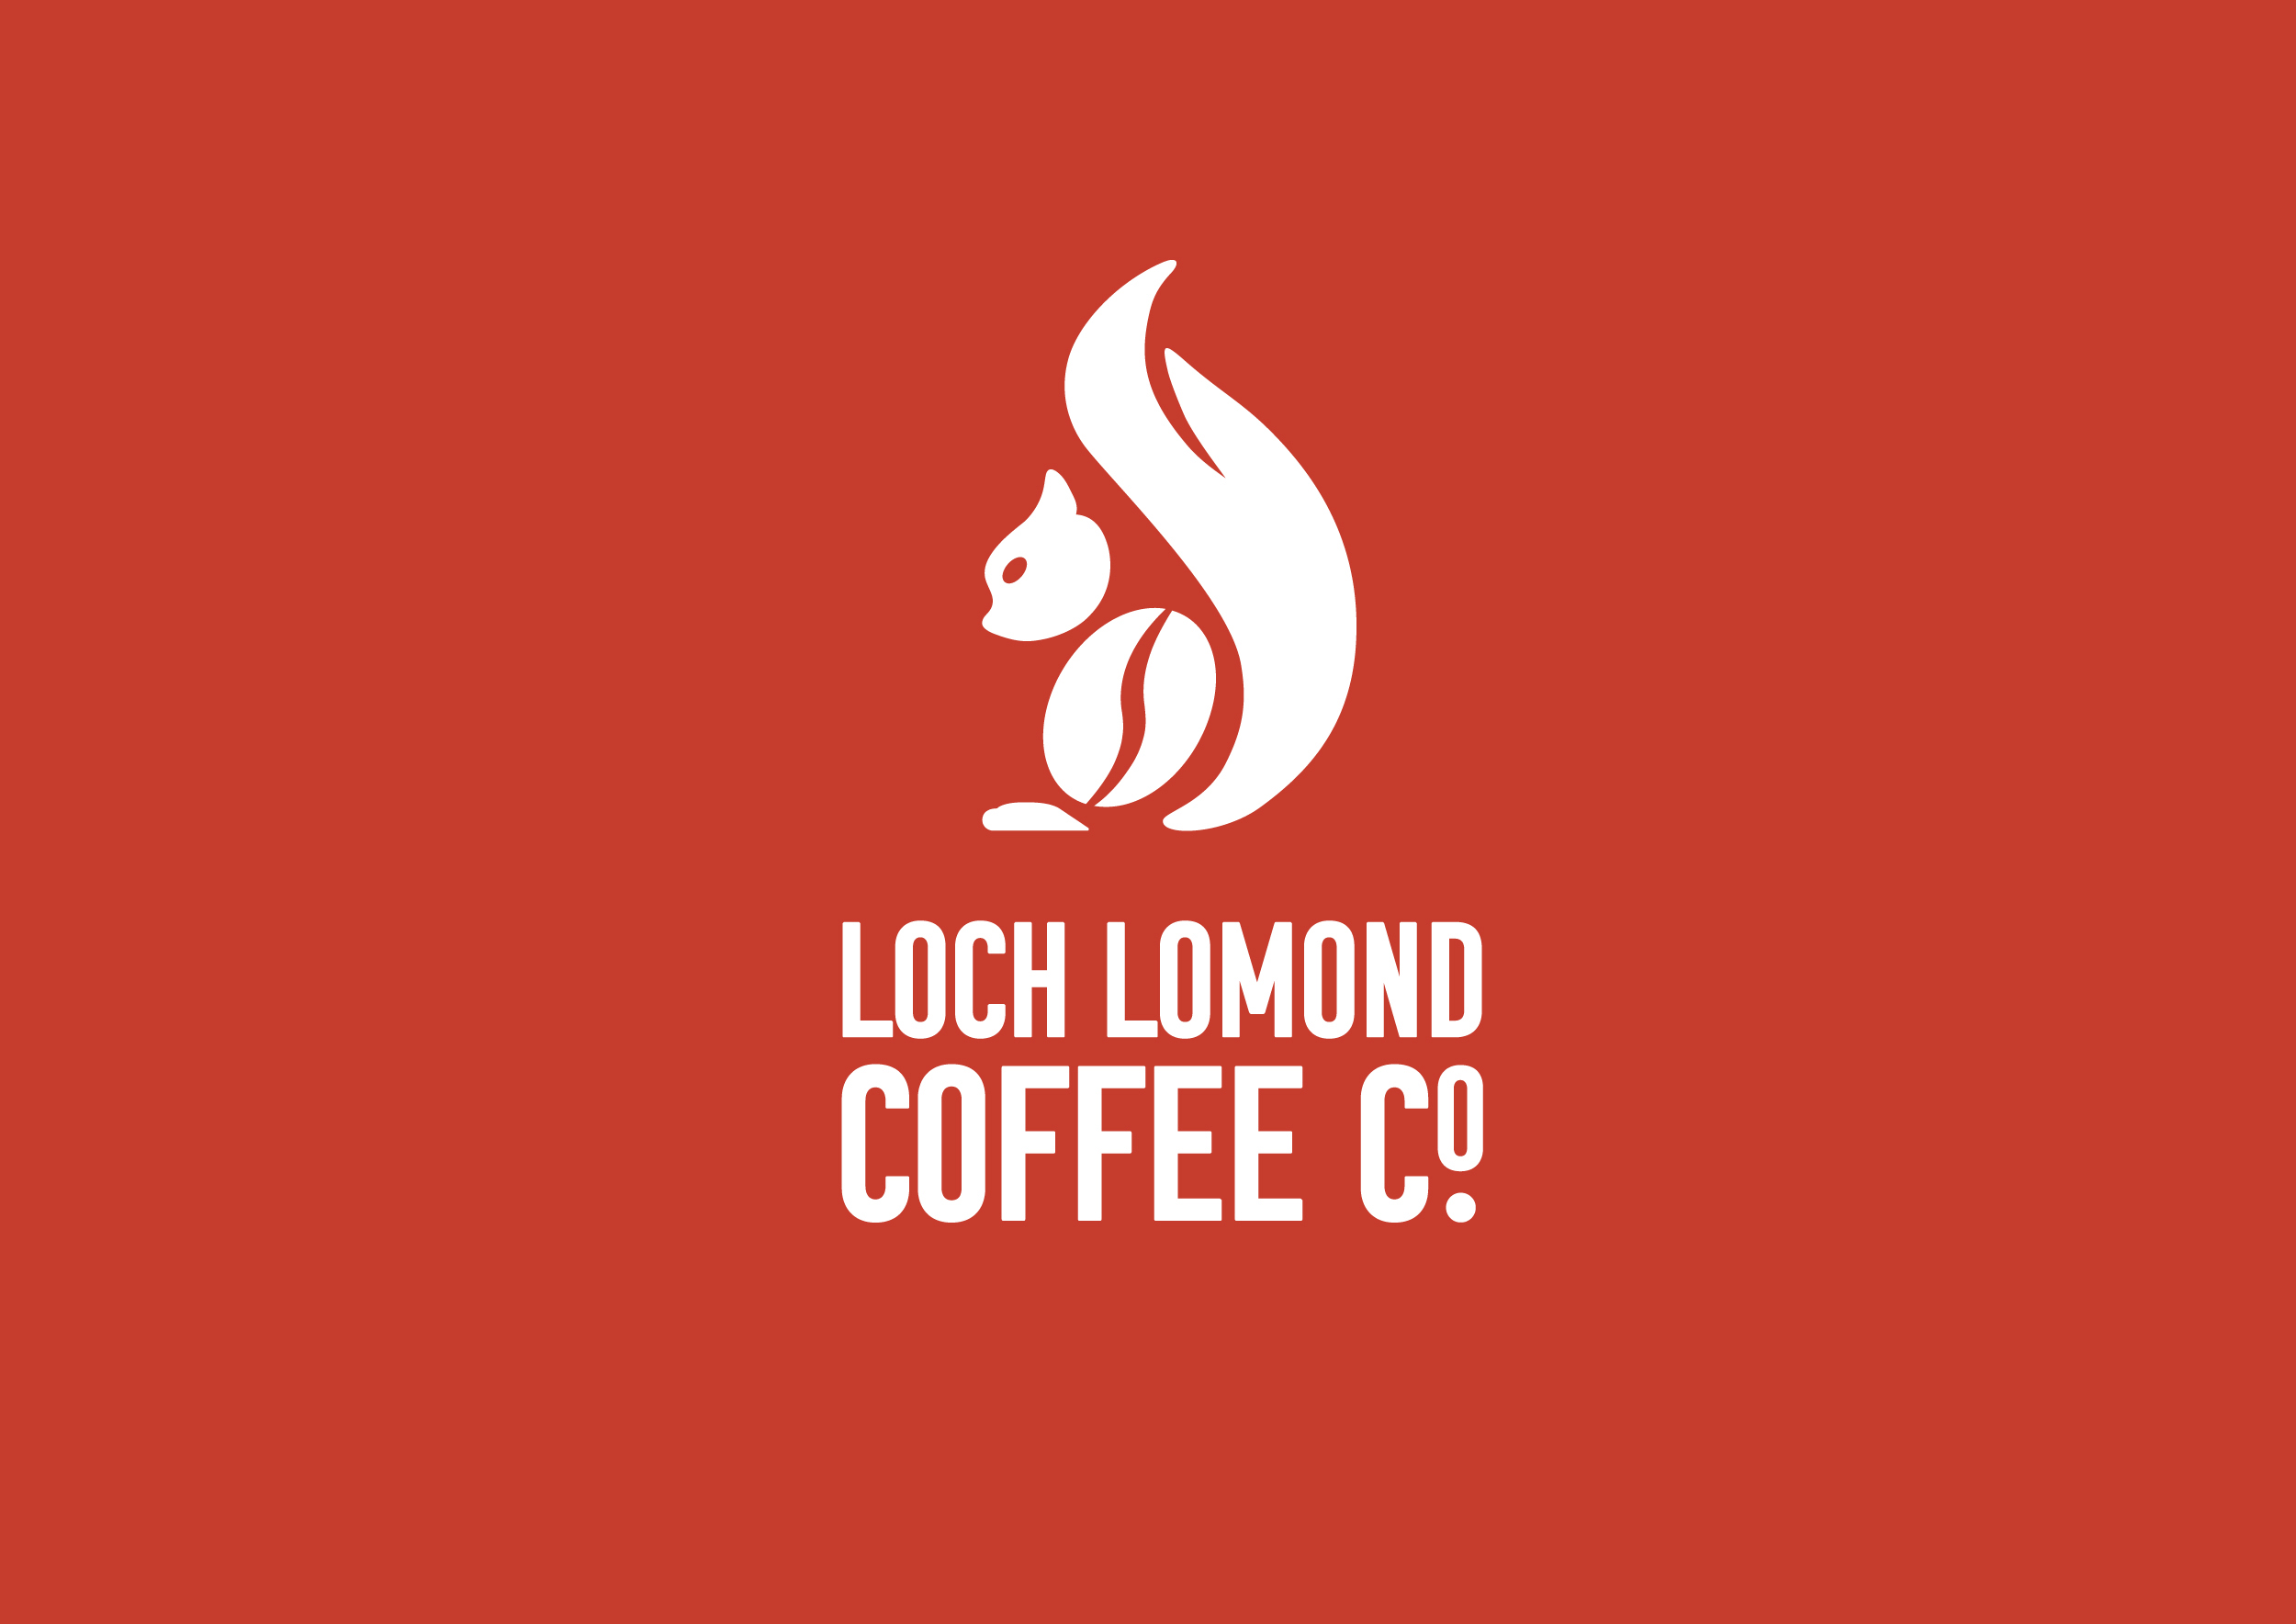 Loch Lomond Coffee Co. Identity